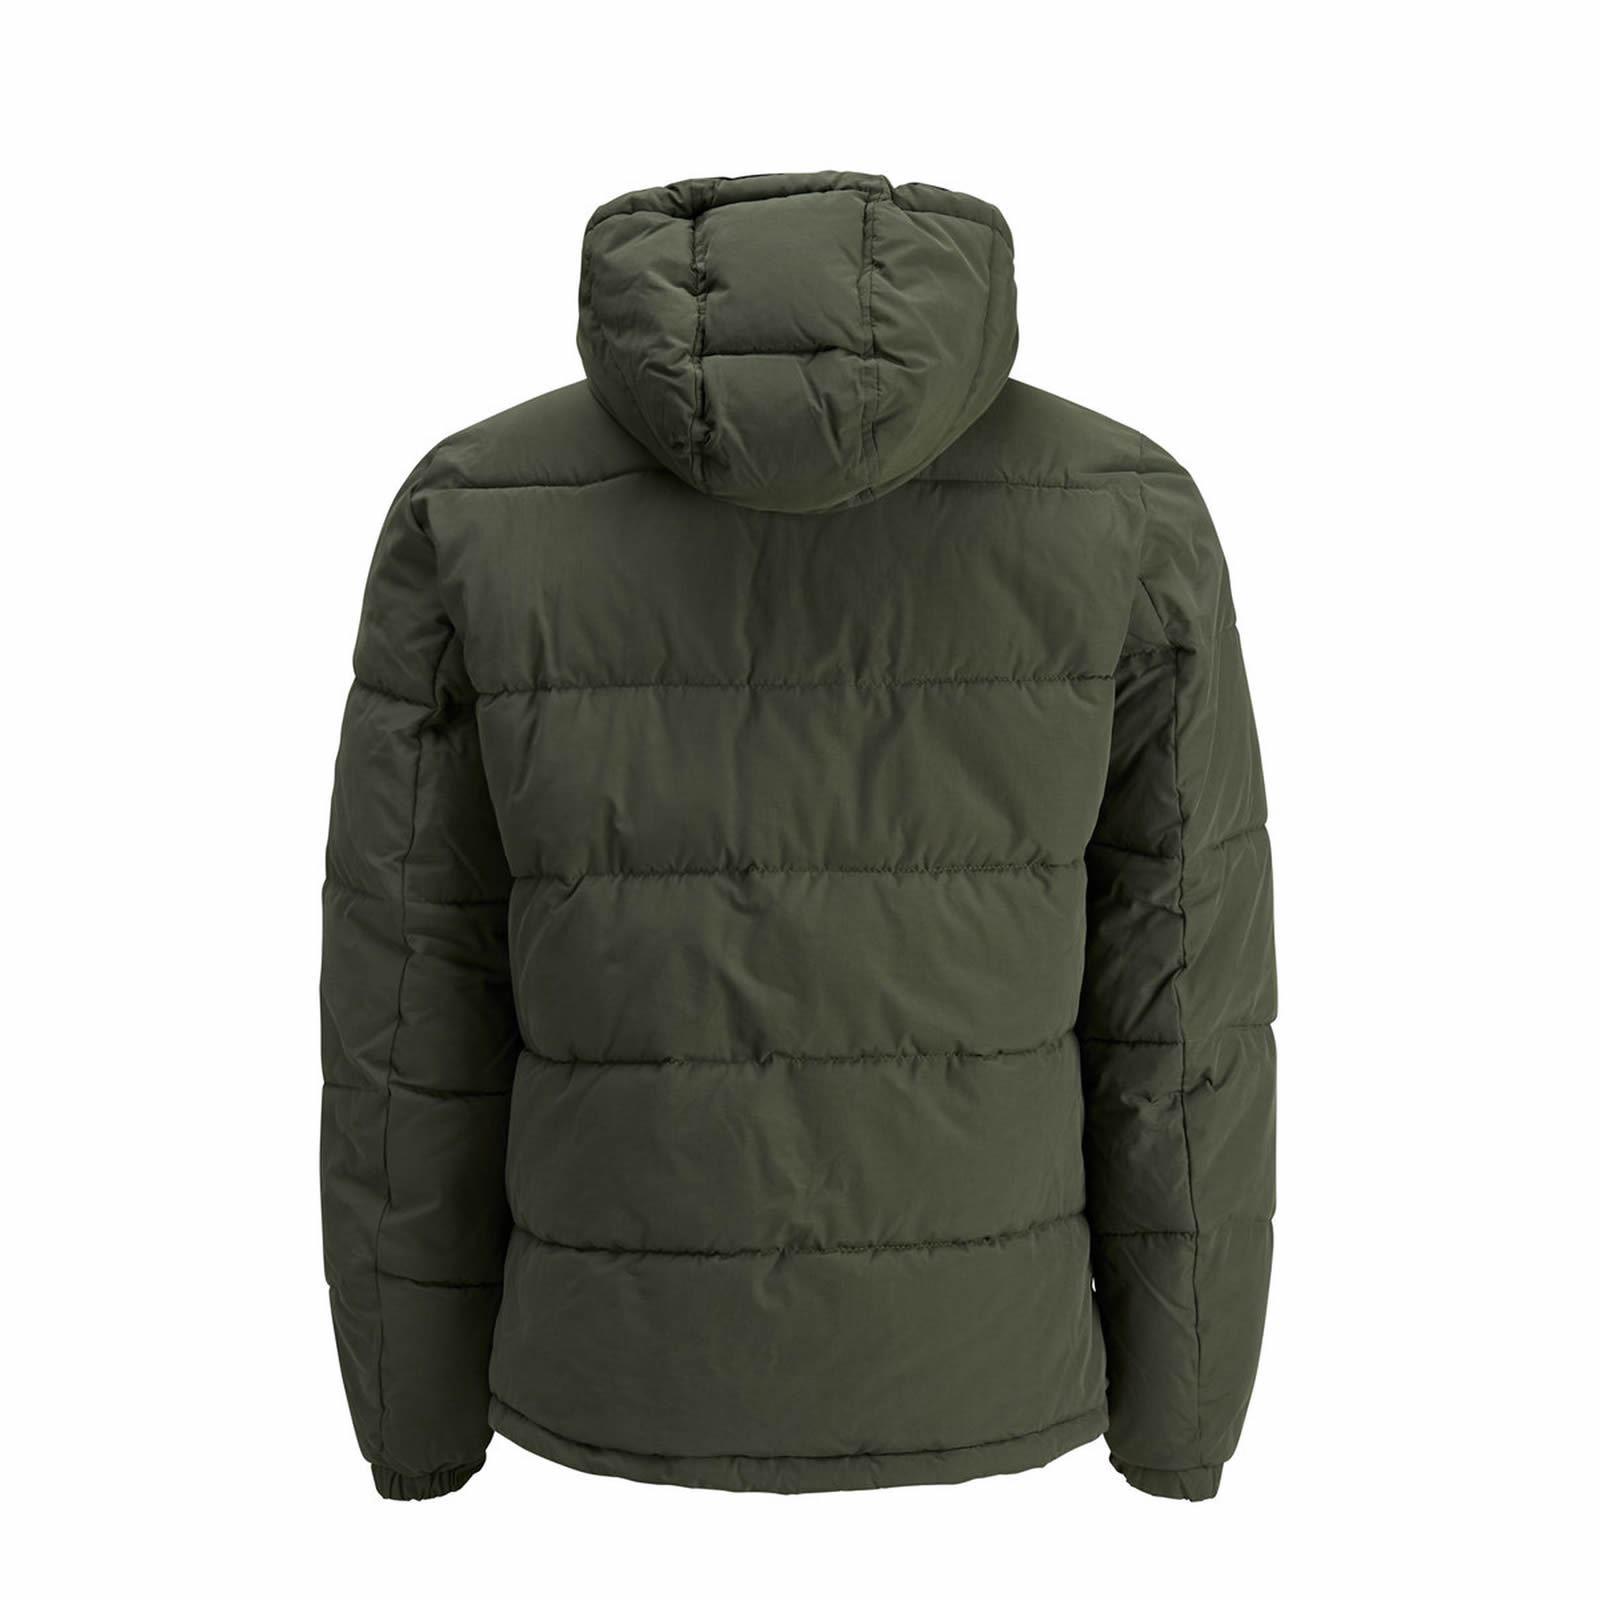 JACK-amp-JONES-Figure-Mens-Jacket-Hooded-Zip-Up-Padded-Bomber-Coat thumbnail 7